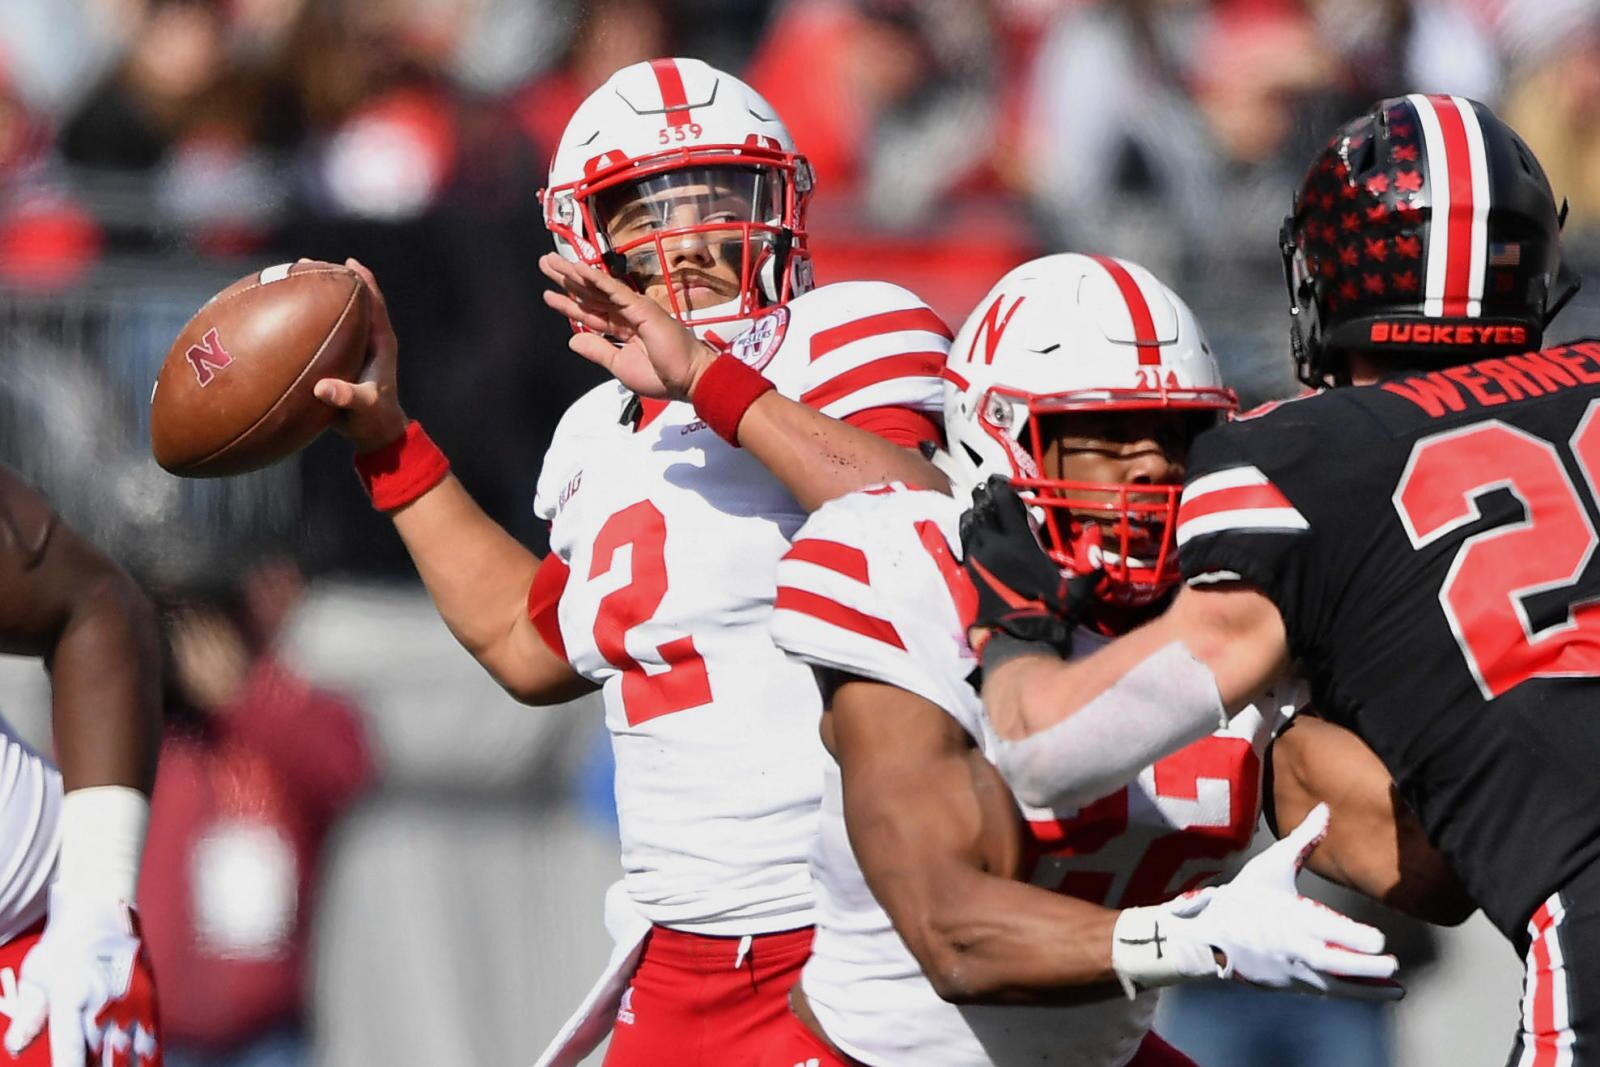 Nebraska Football gets well-deserved national media recognition